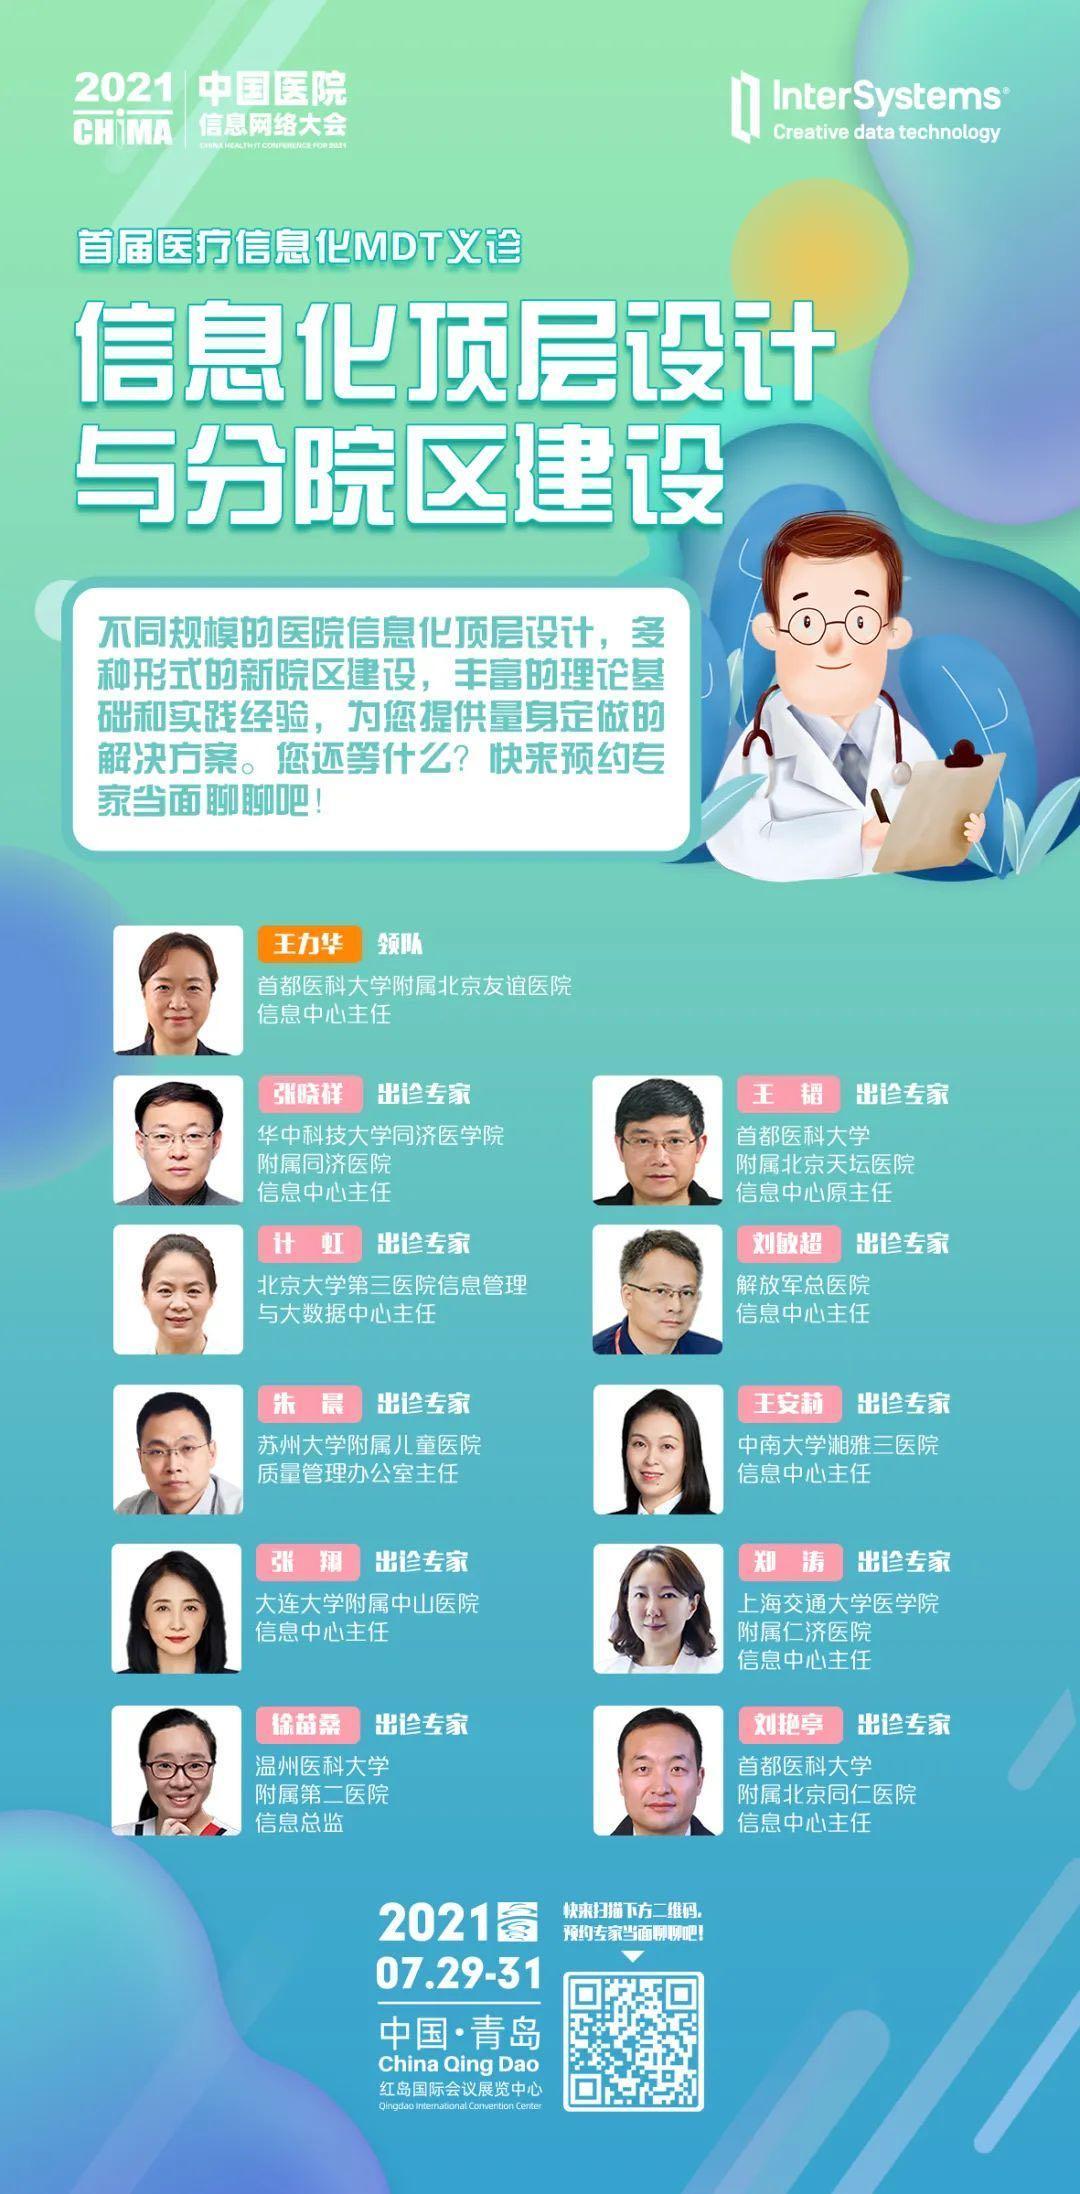 CHIMA首届医疗信息化MDT义诊,七大专家阵容,等你来约!